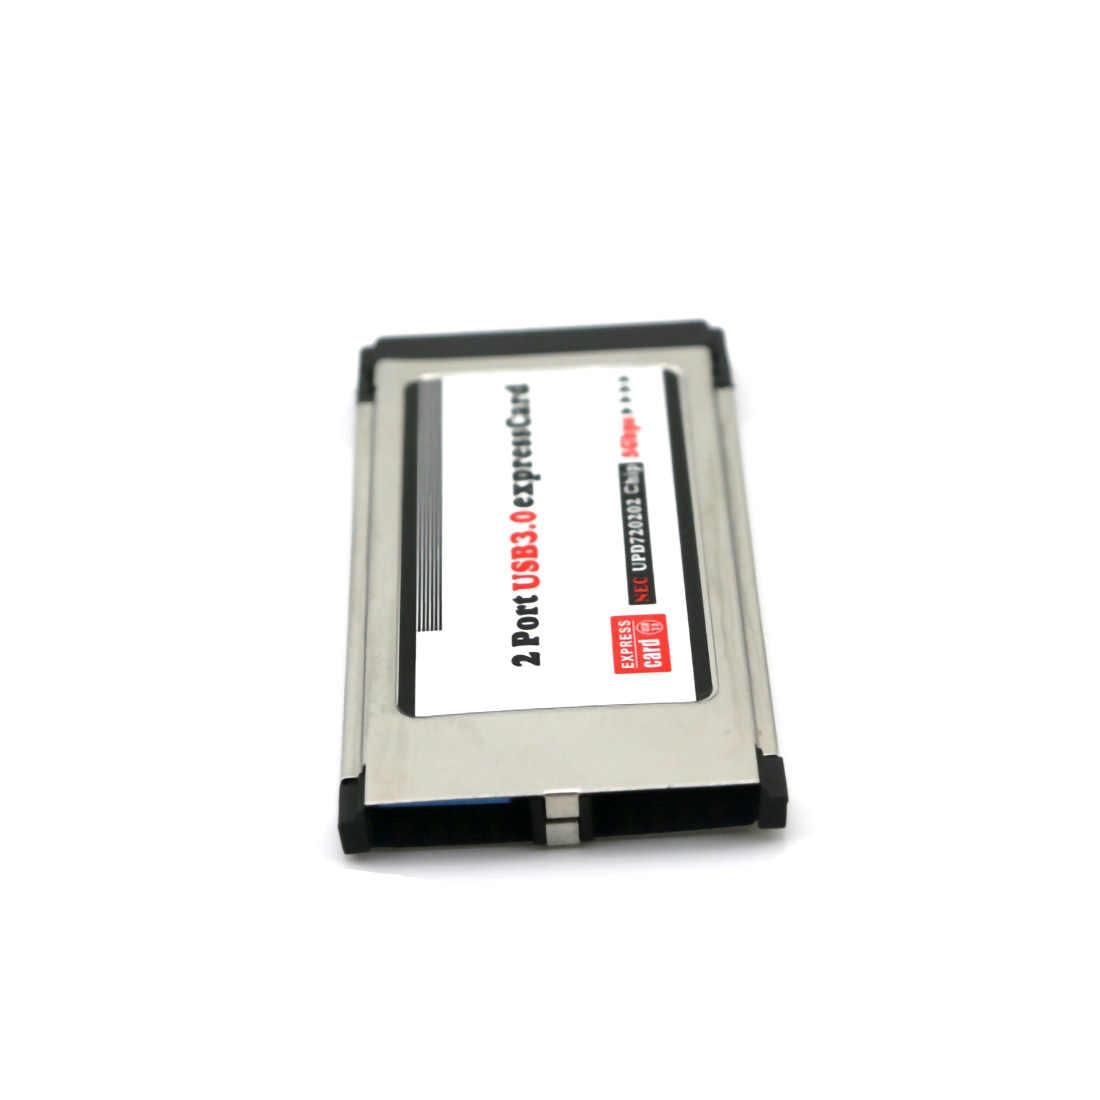 PCI-E PCI Express to 2 Port USB 3.0 34 Mm Expresscard Card Converter Adapter